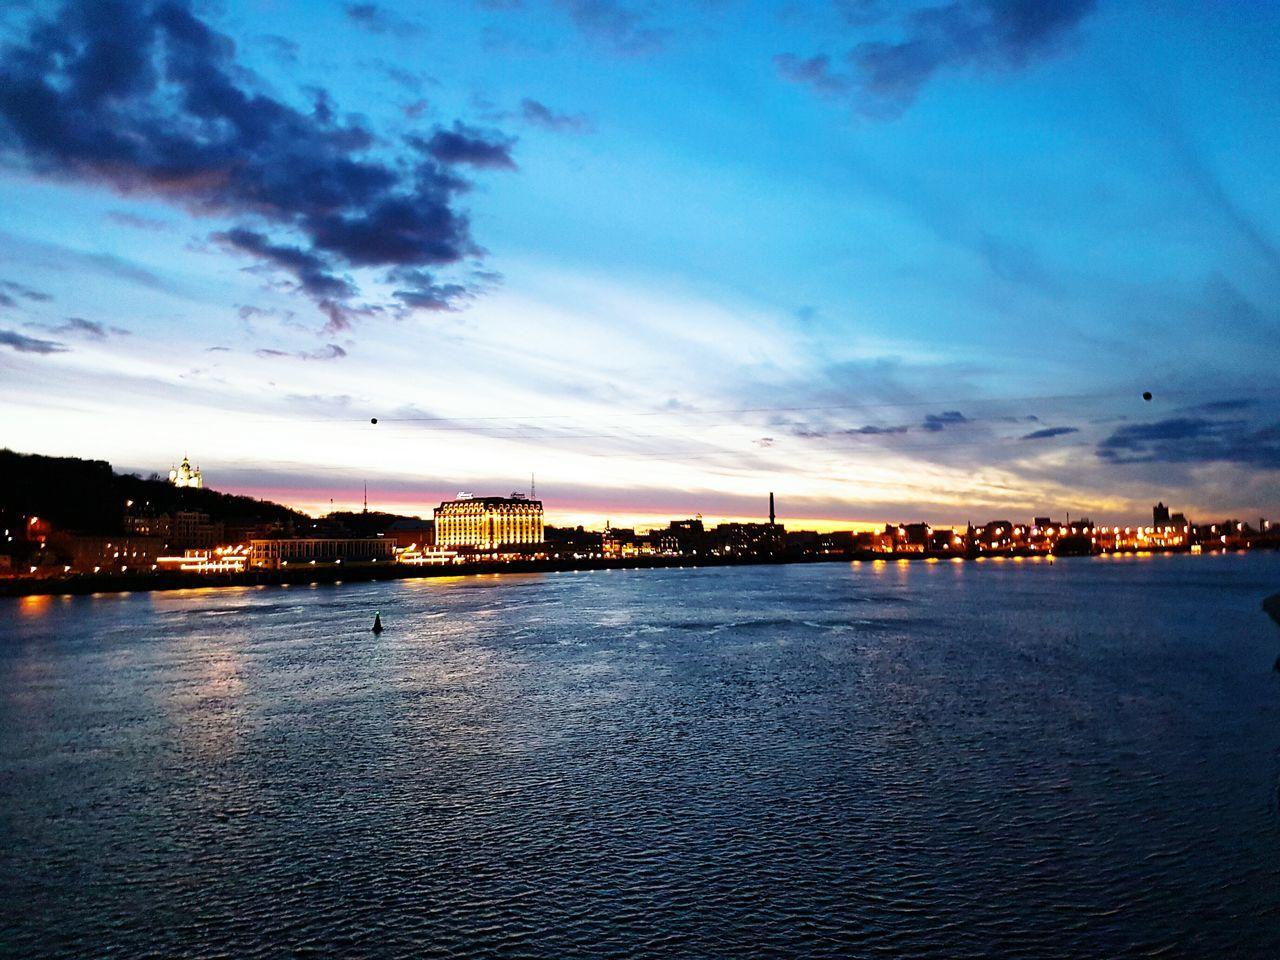 Киев Kiev Dnepr вечер мост First Eyeem Photo